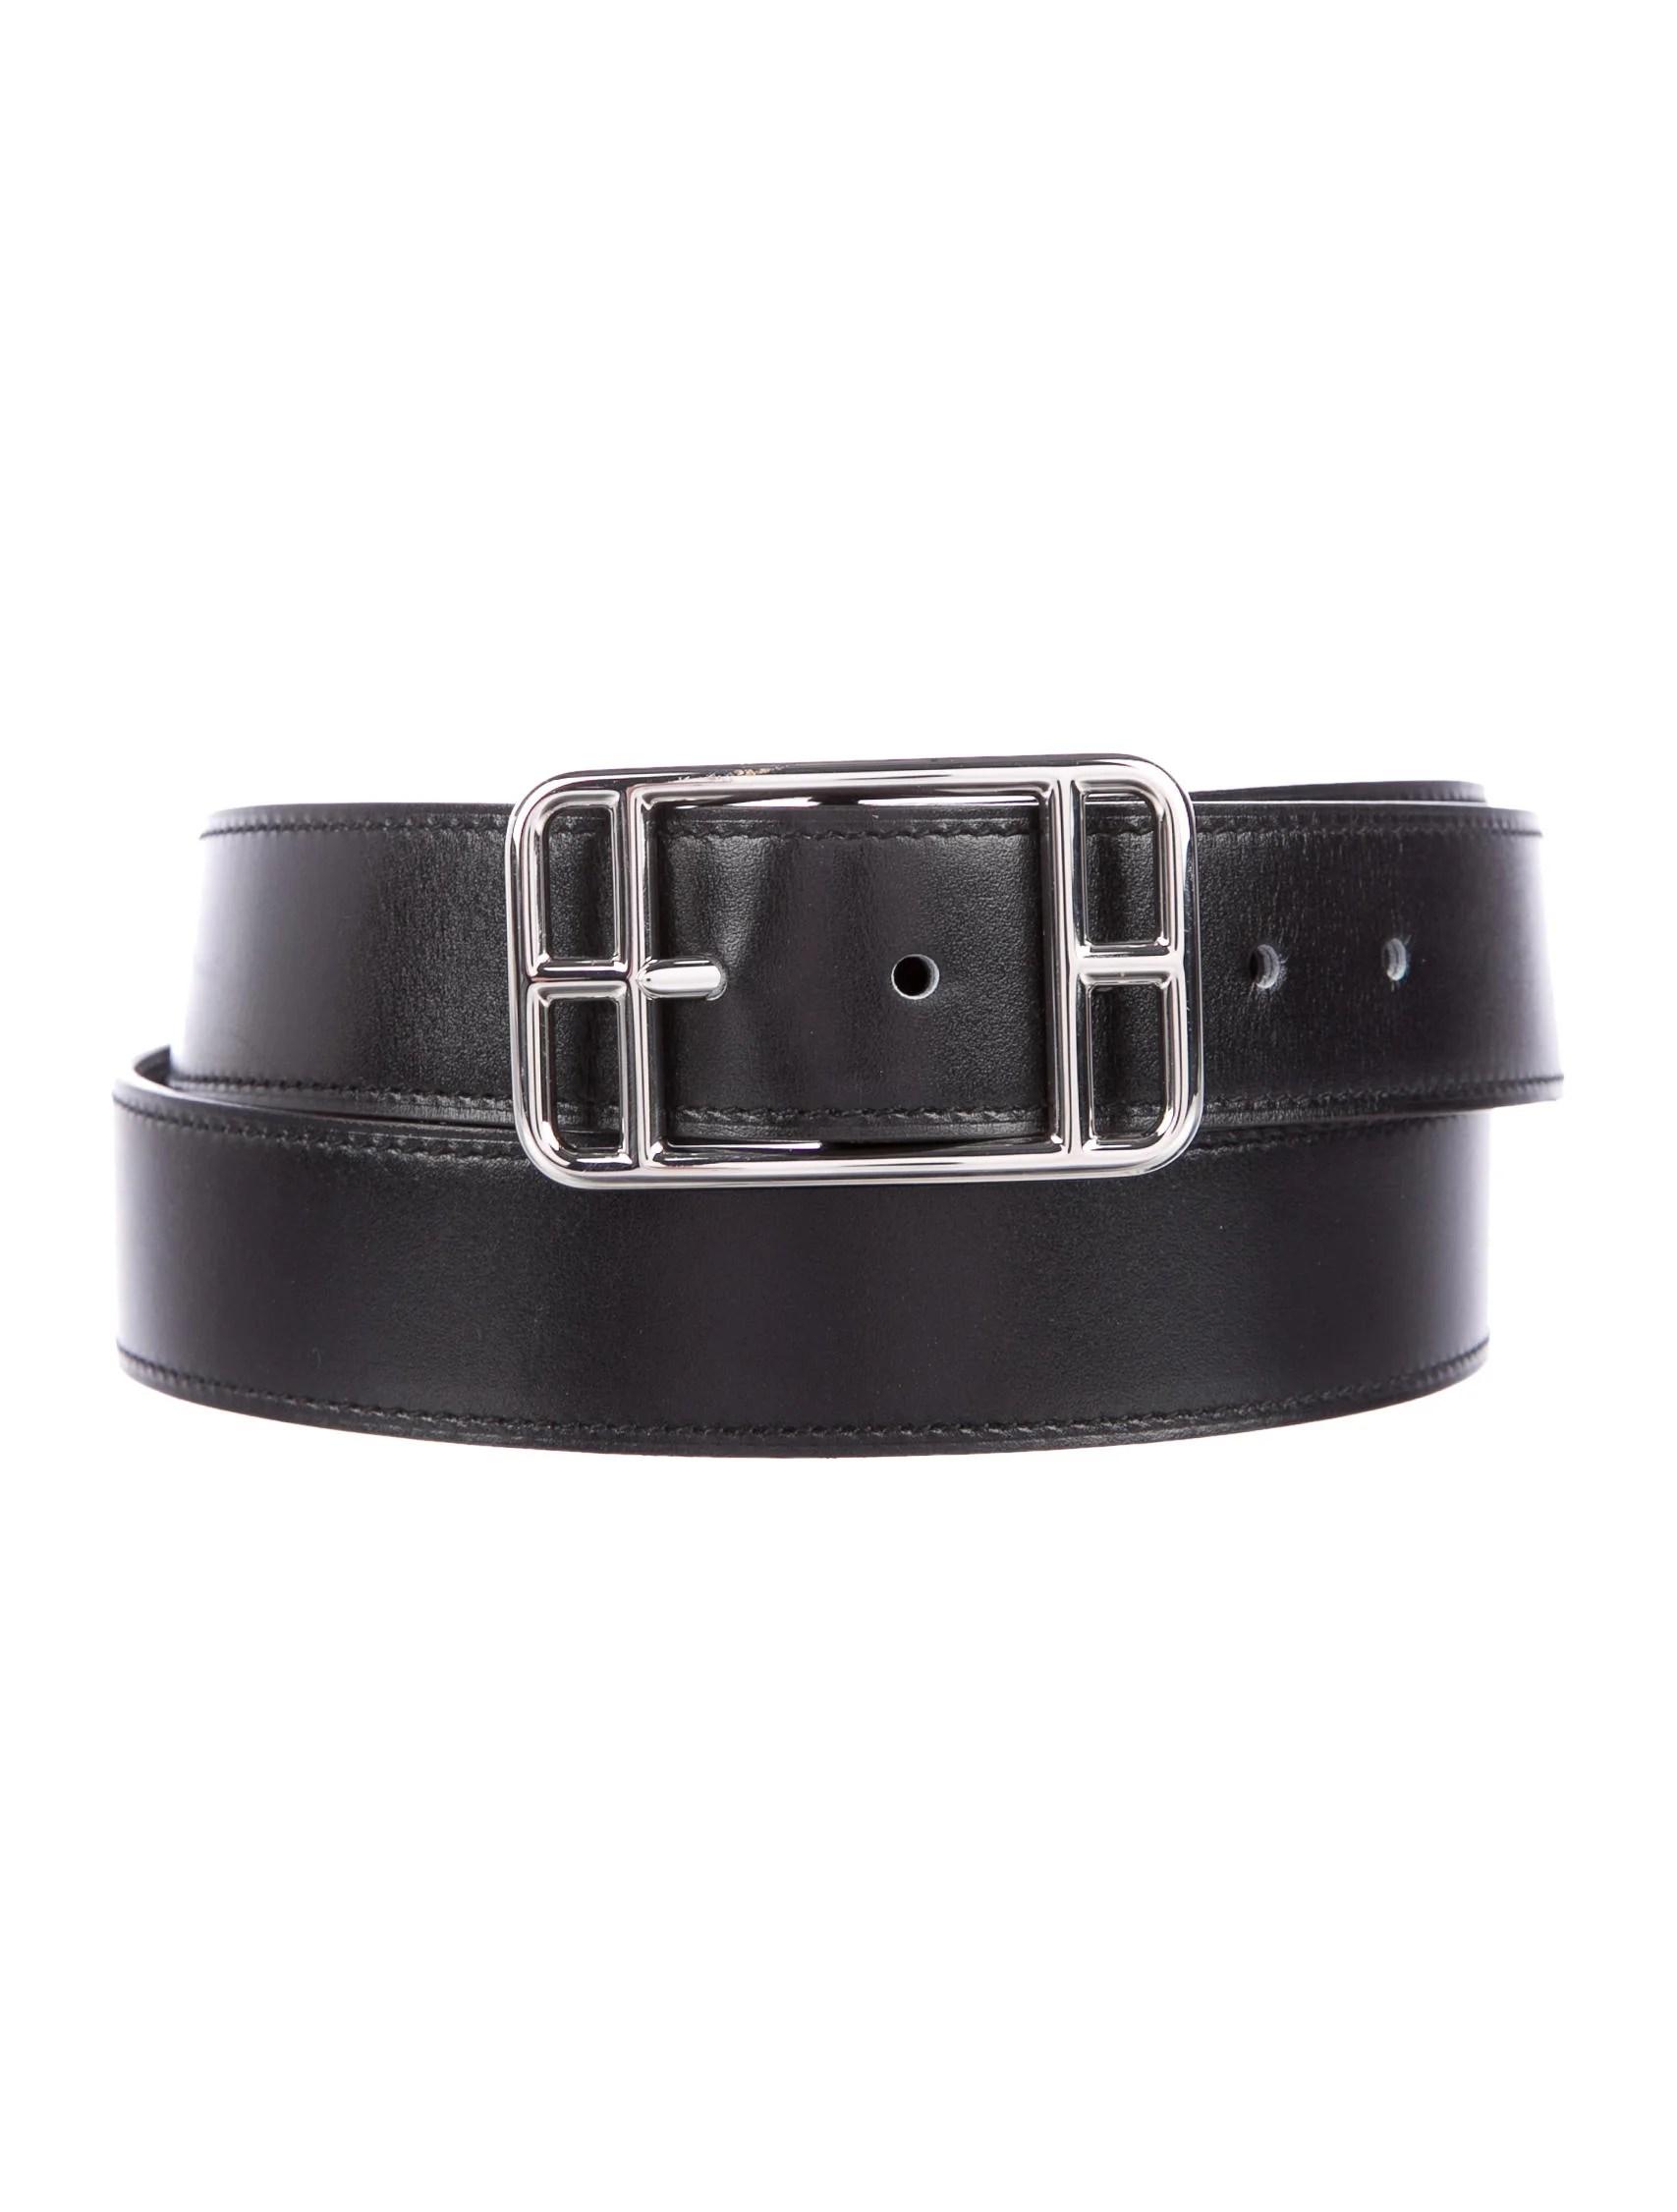 Hermès 2015 Cape Cod Reversible Belt  Accessories